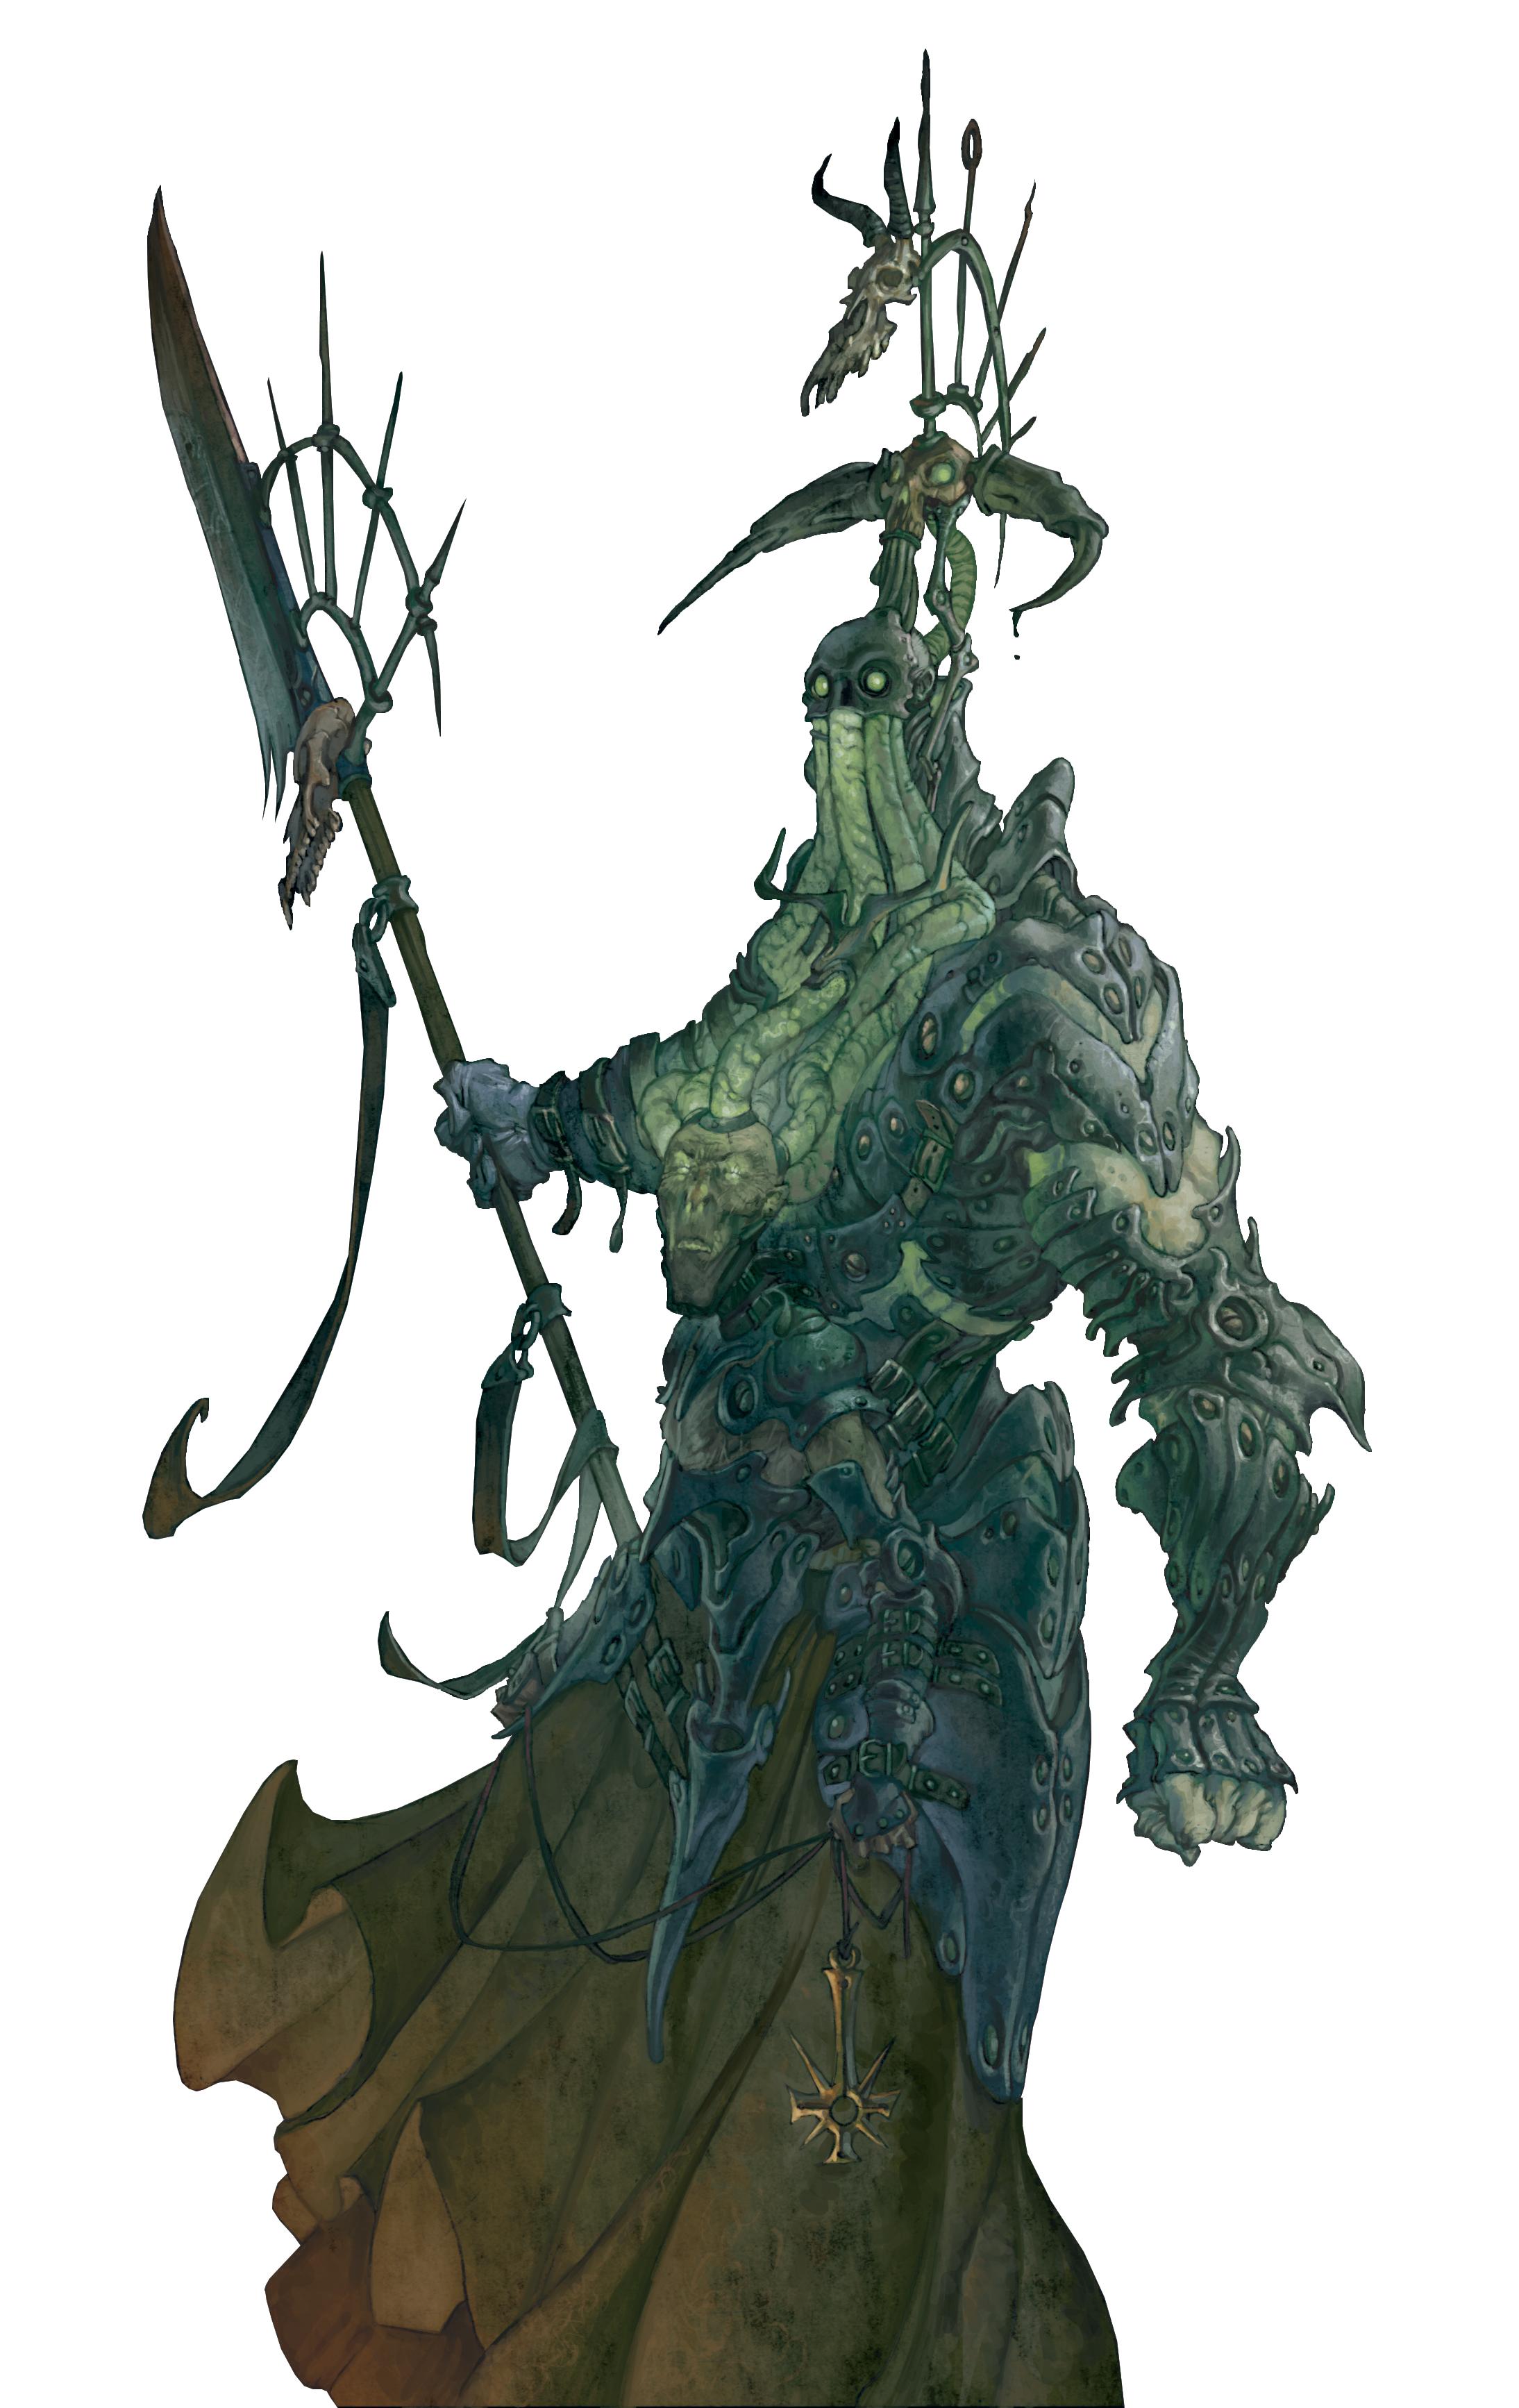 Rackham | Confrontation/Rag'Narok/Hybrid - Alchemists of Dirz | Edouard Guiton | Florent Maudoux